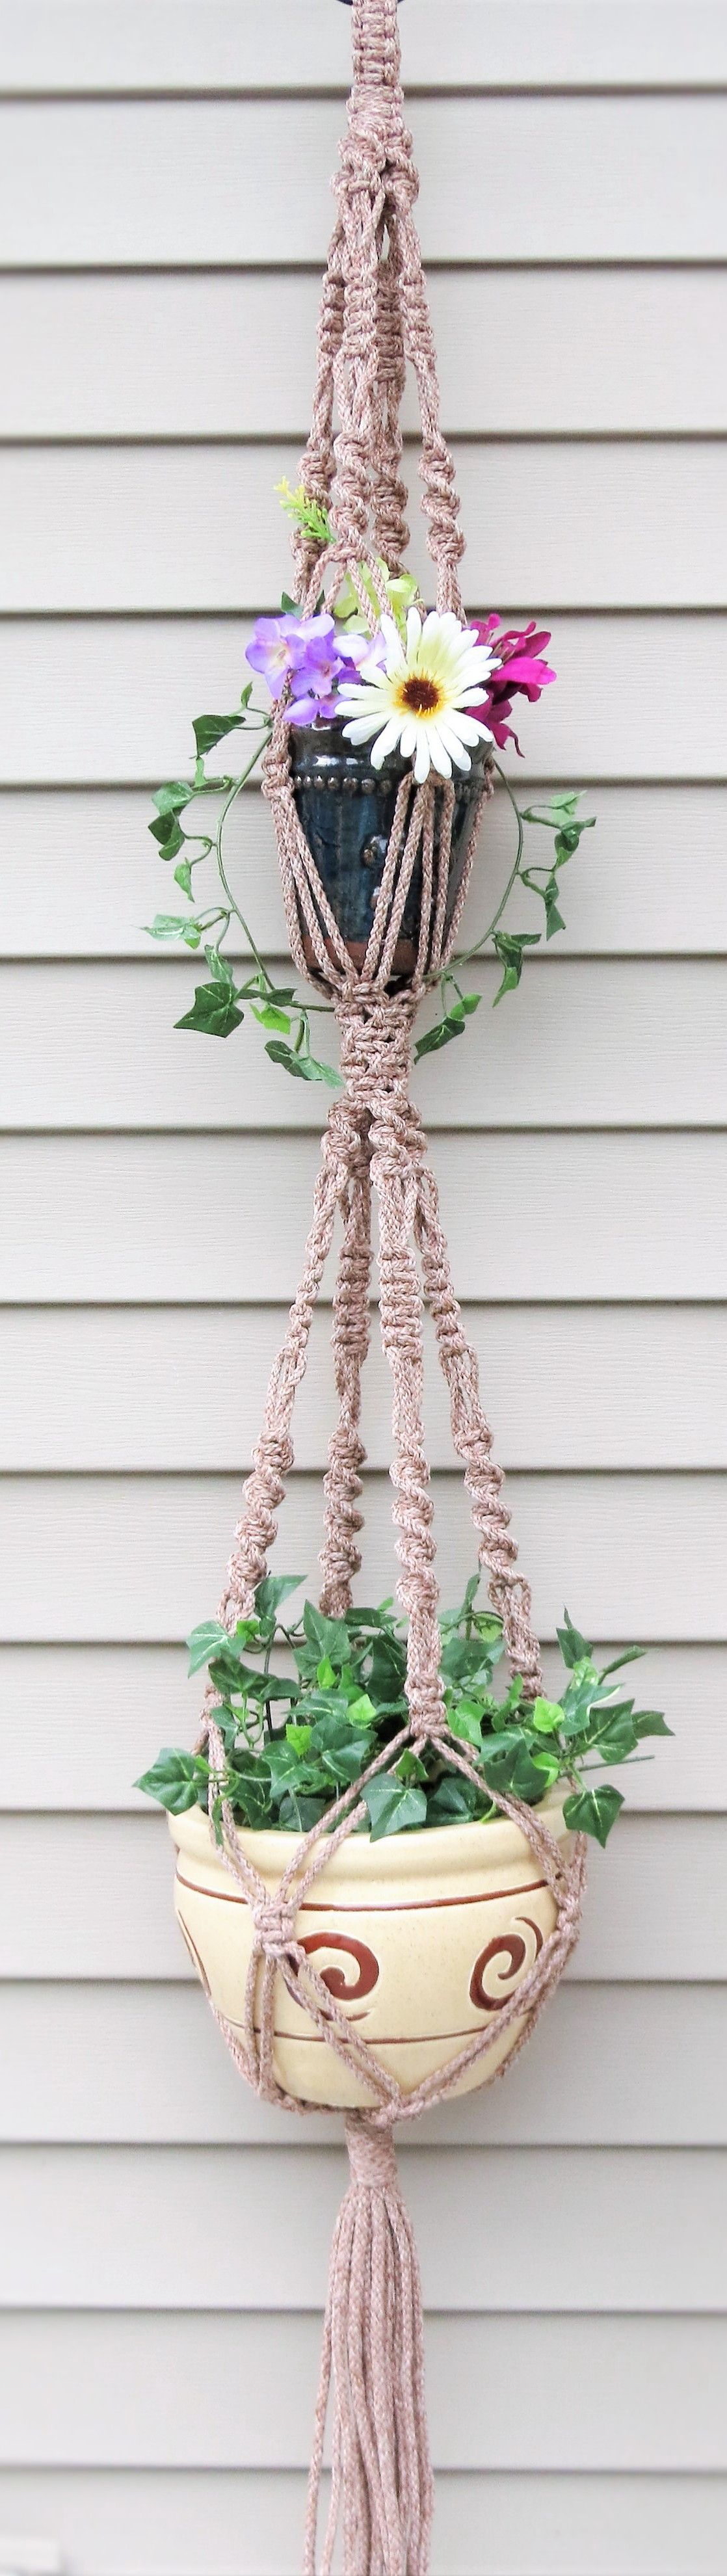 double macrame hanging planter 2 tier plant holder pot holder